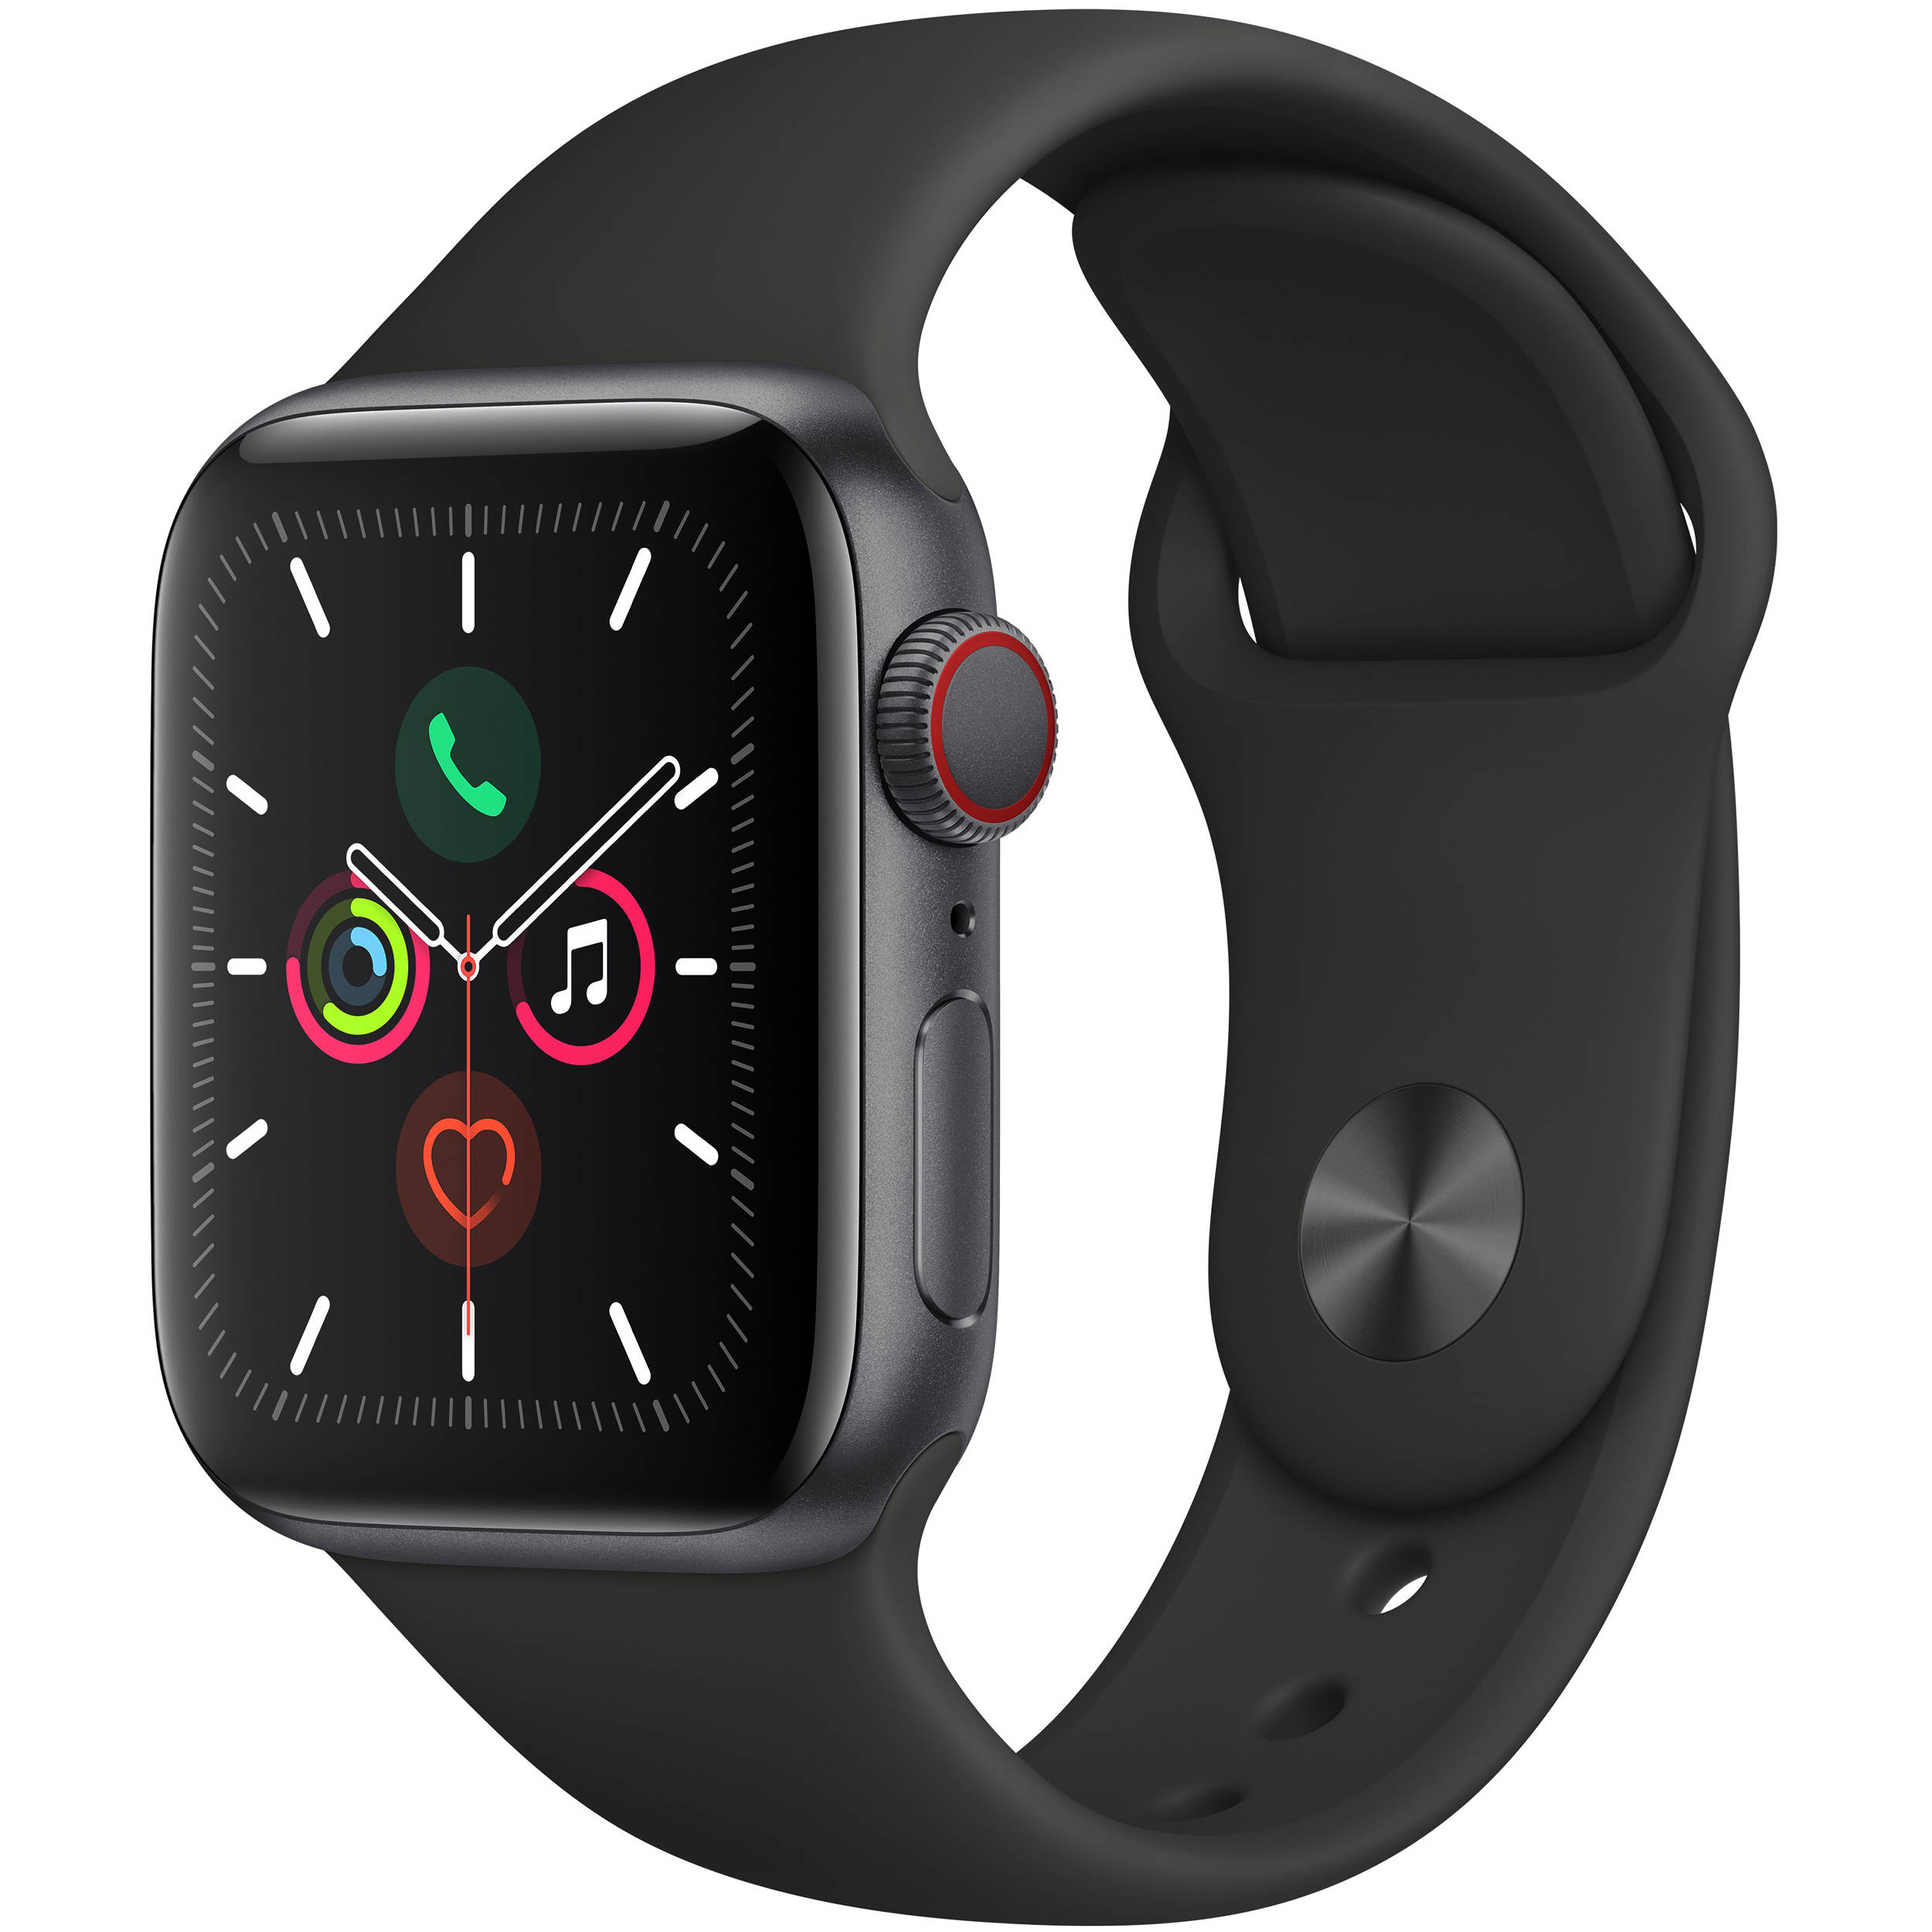 Apple Watch Series 5 MWWQ2LL/A B&H Photo Video